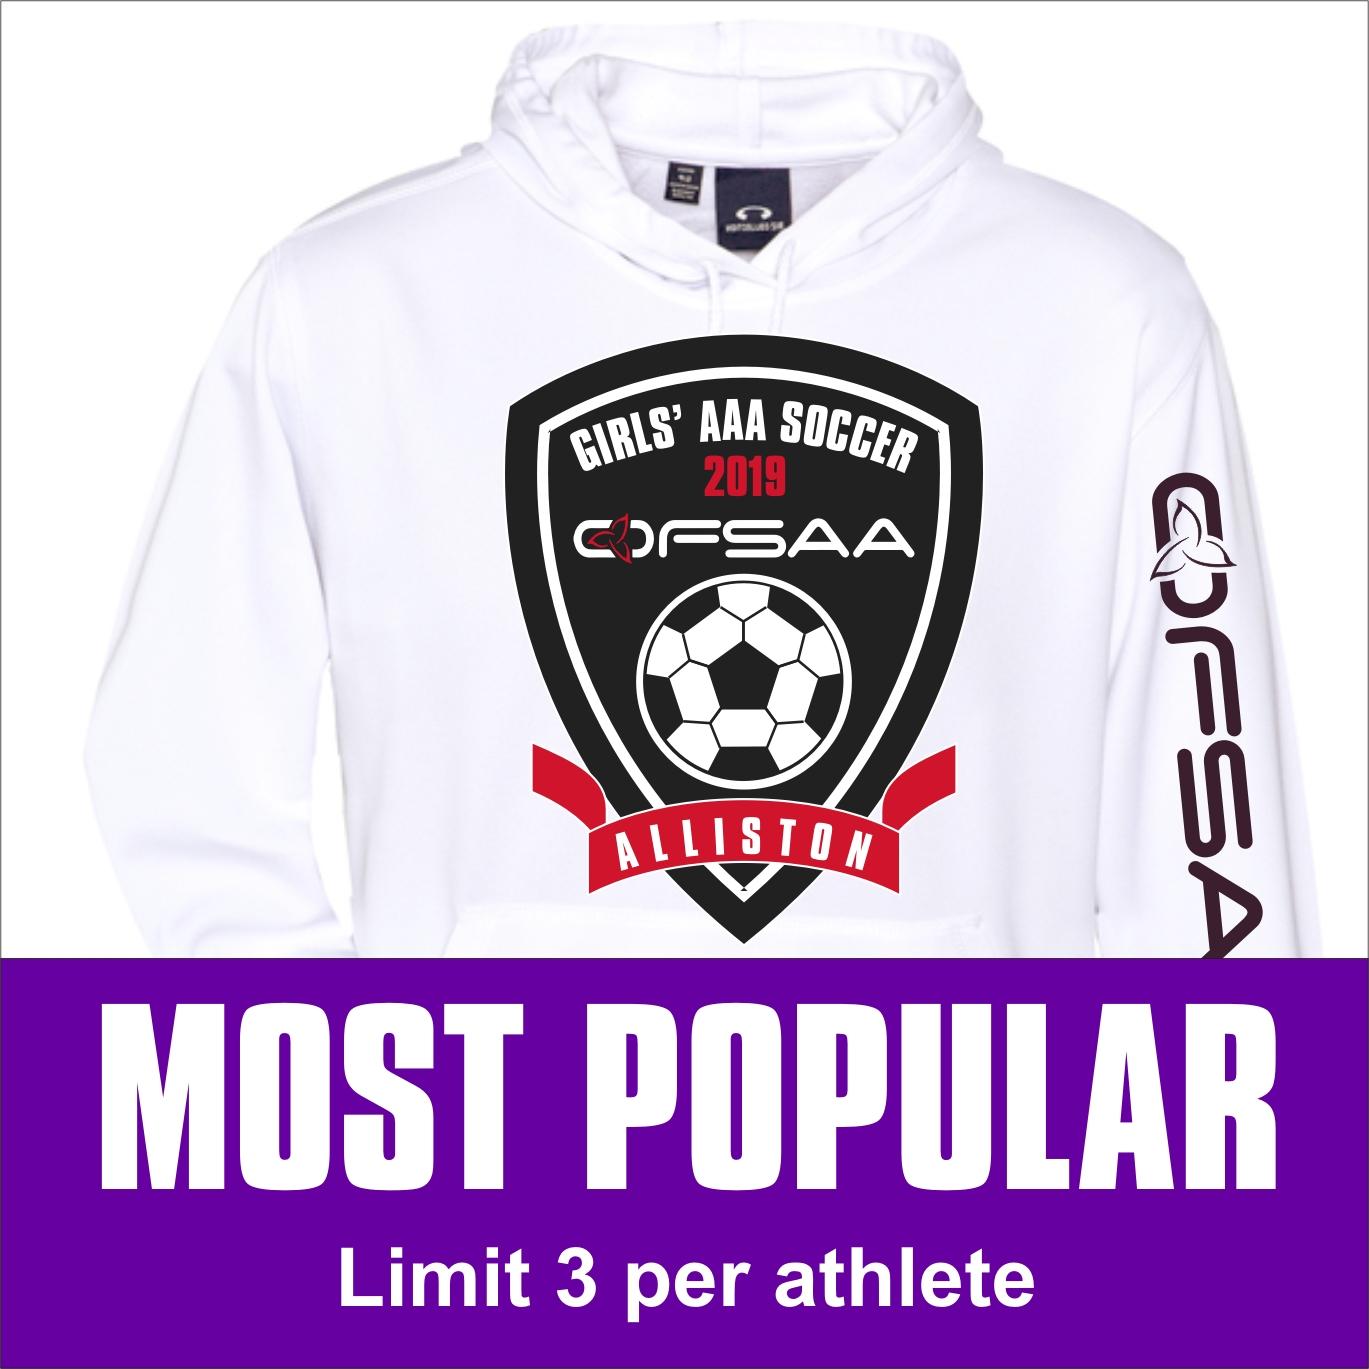 2019 Girls AAA Soccer Hoodie white.jpg